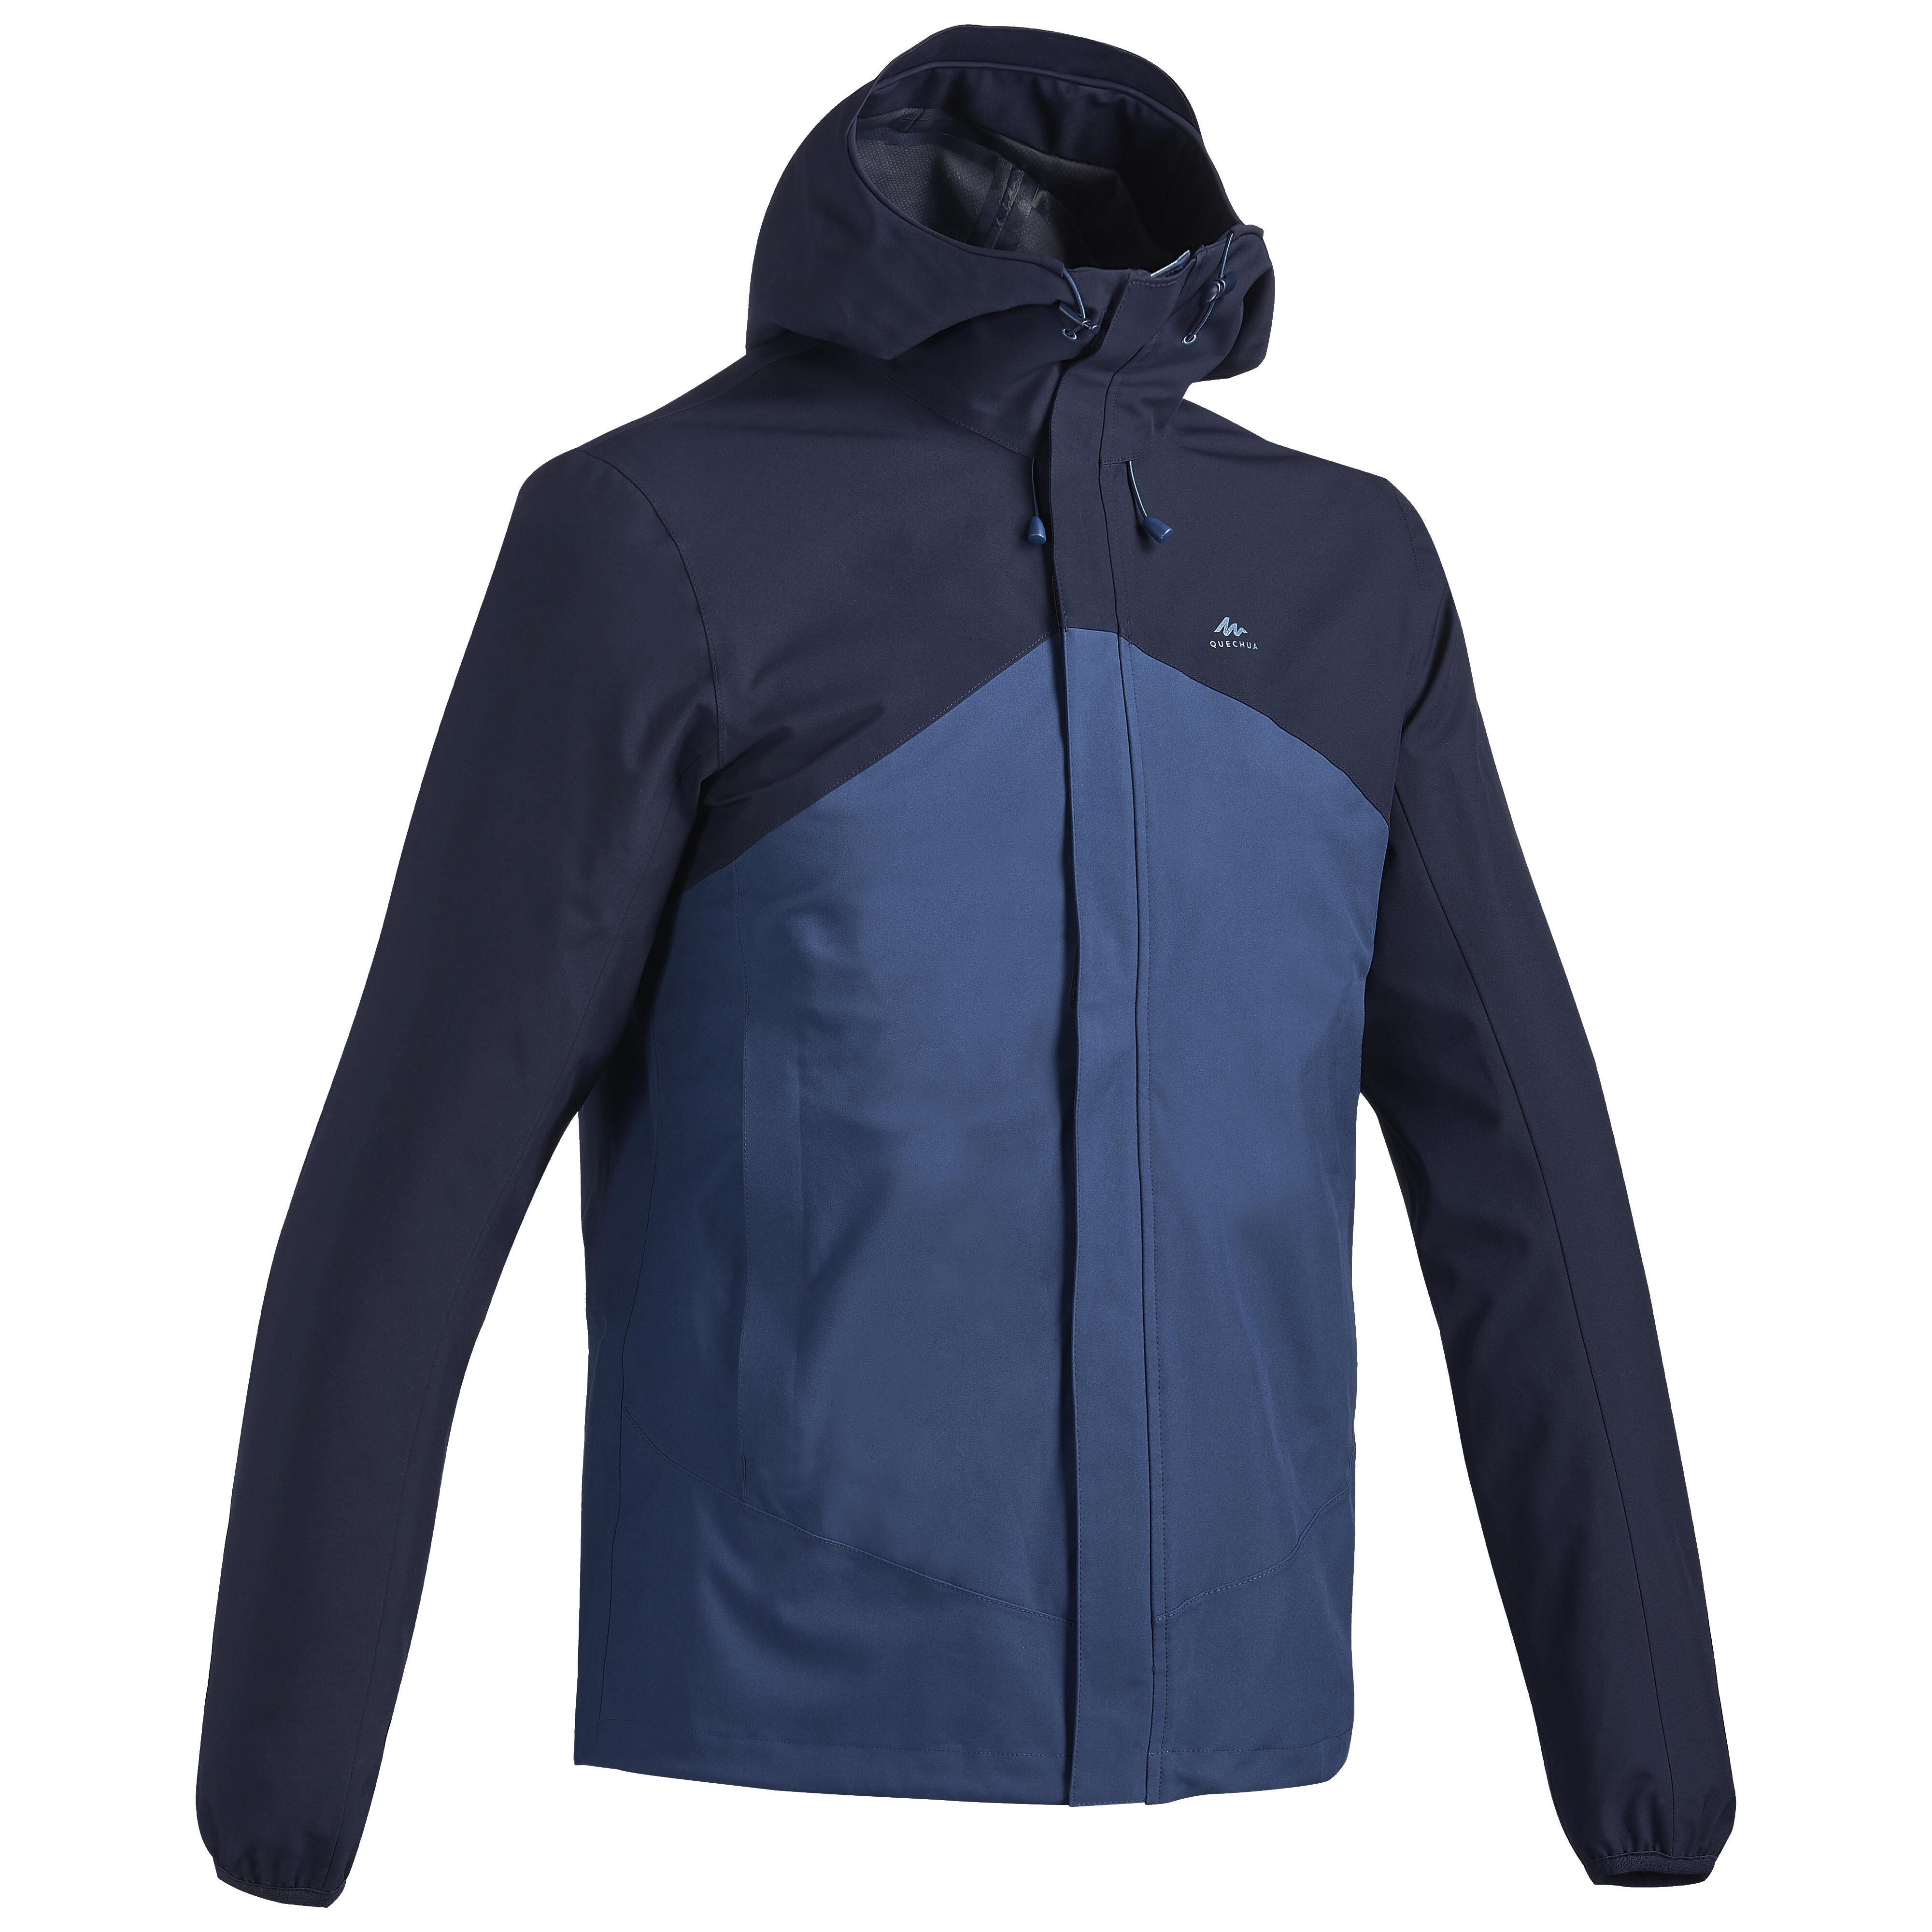 Jachetă drumeție MH150 bărbați